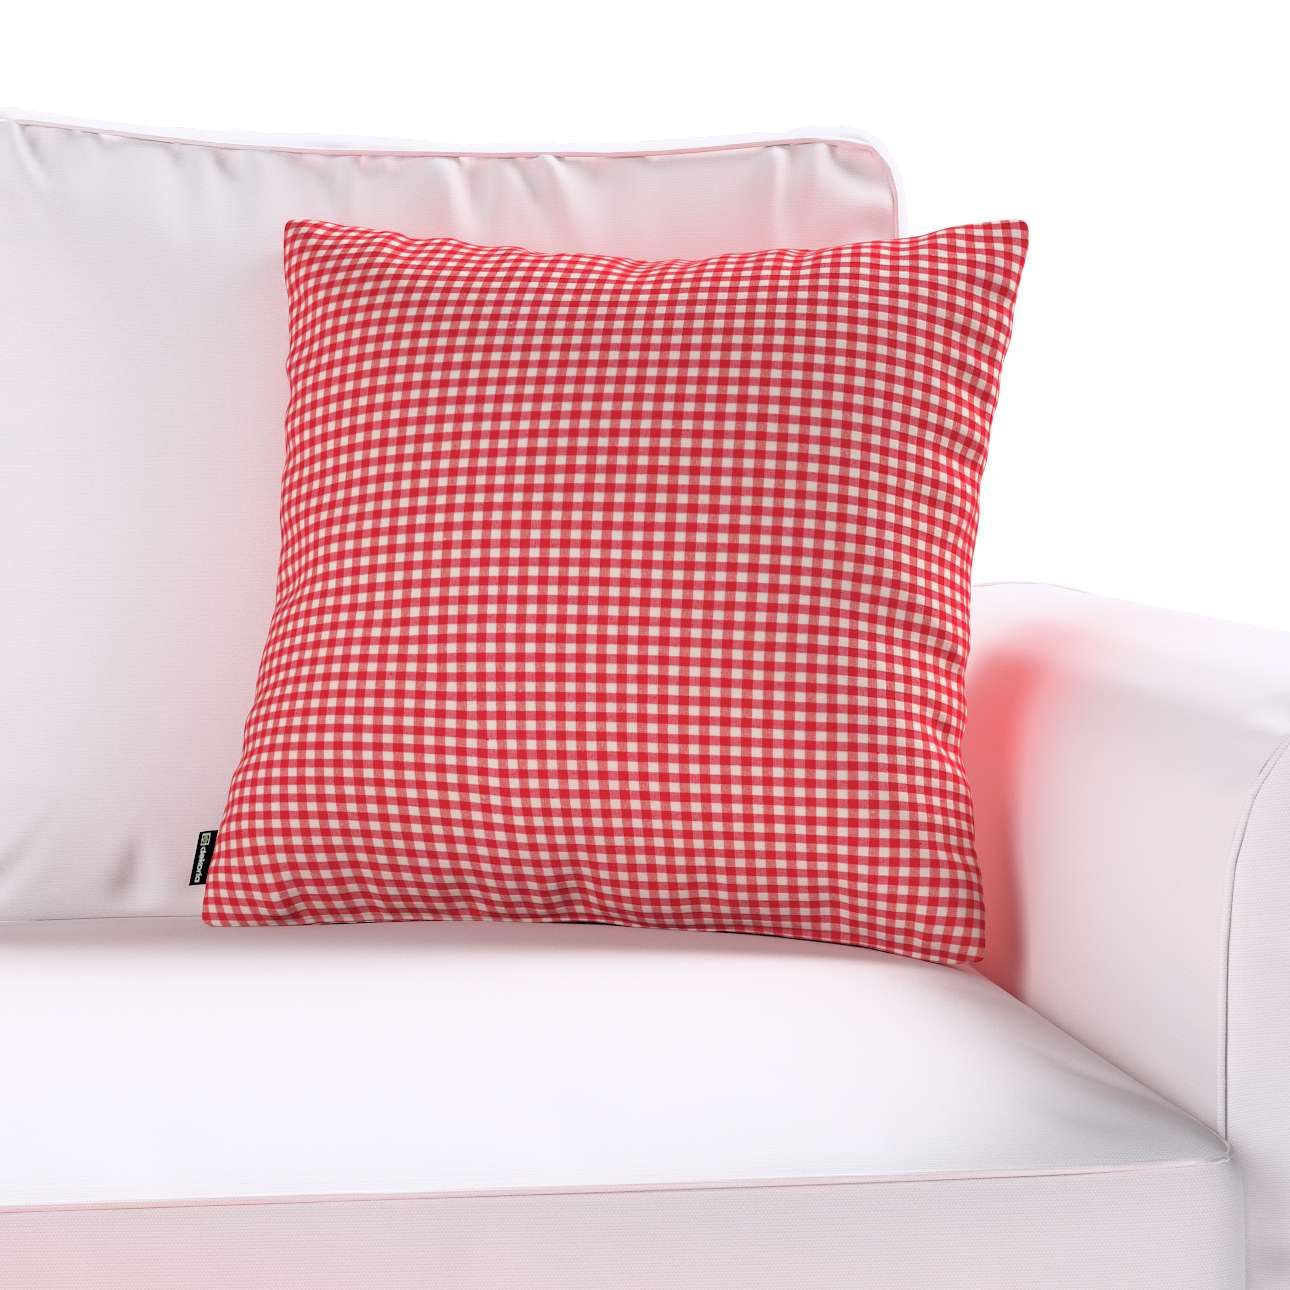 Kinga cushion cover in collection Quadro, fabric: 136-15